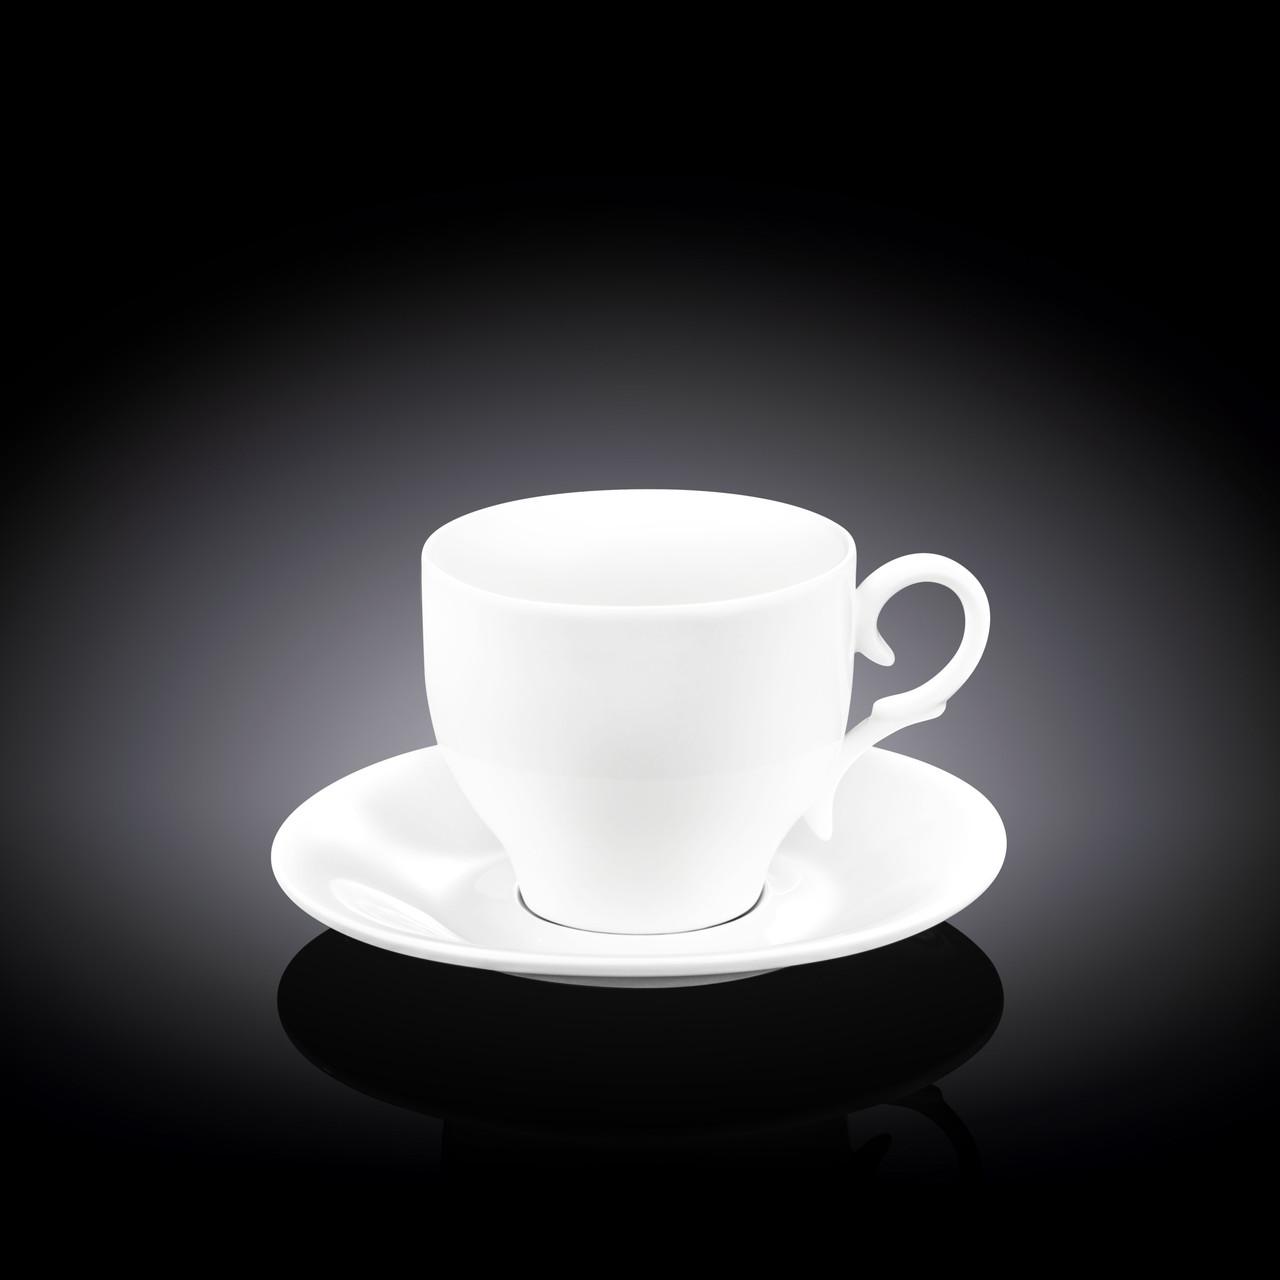 Набор: чайная чашка и блюдце Wilmax 220 мл 6 пар (фирменная коробка)